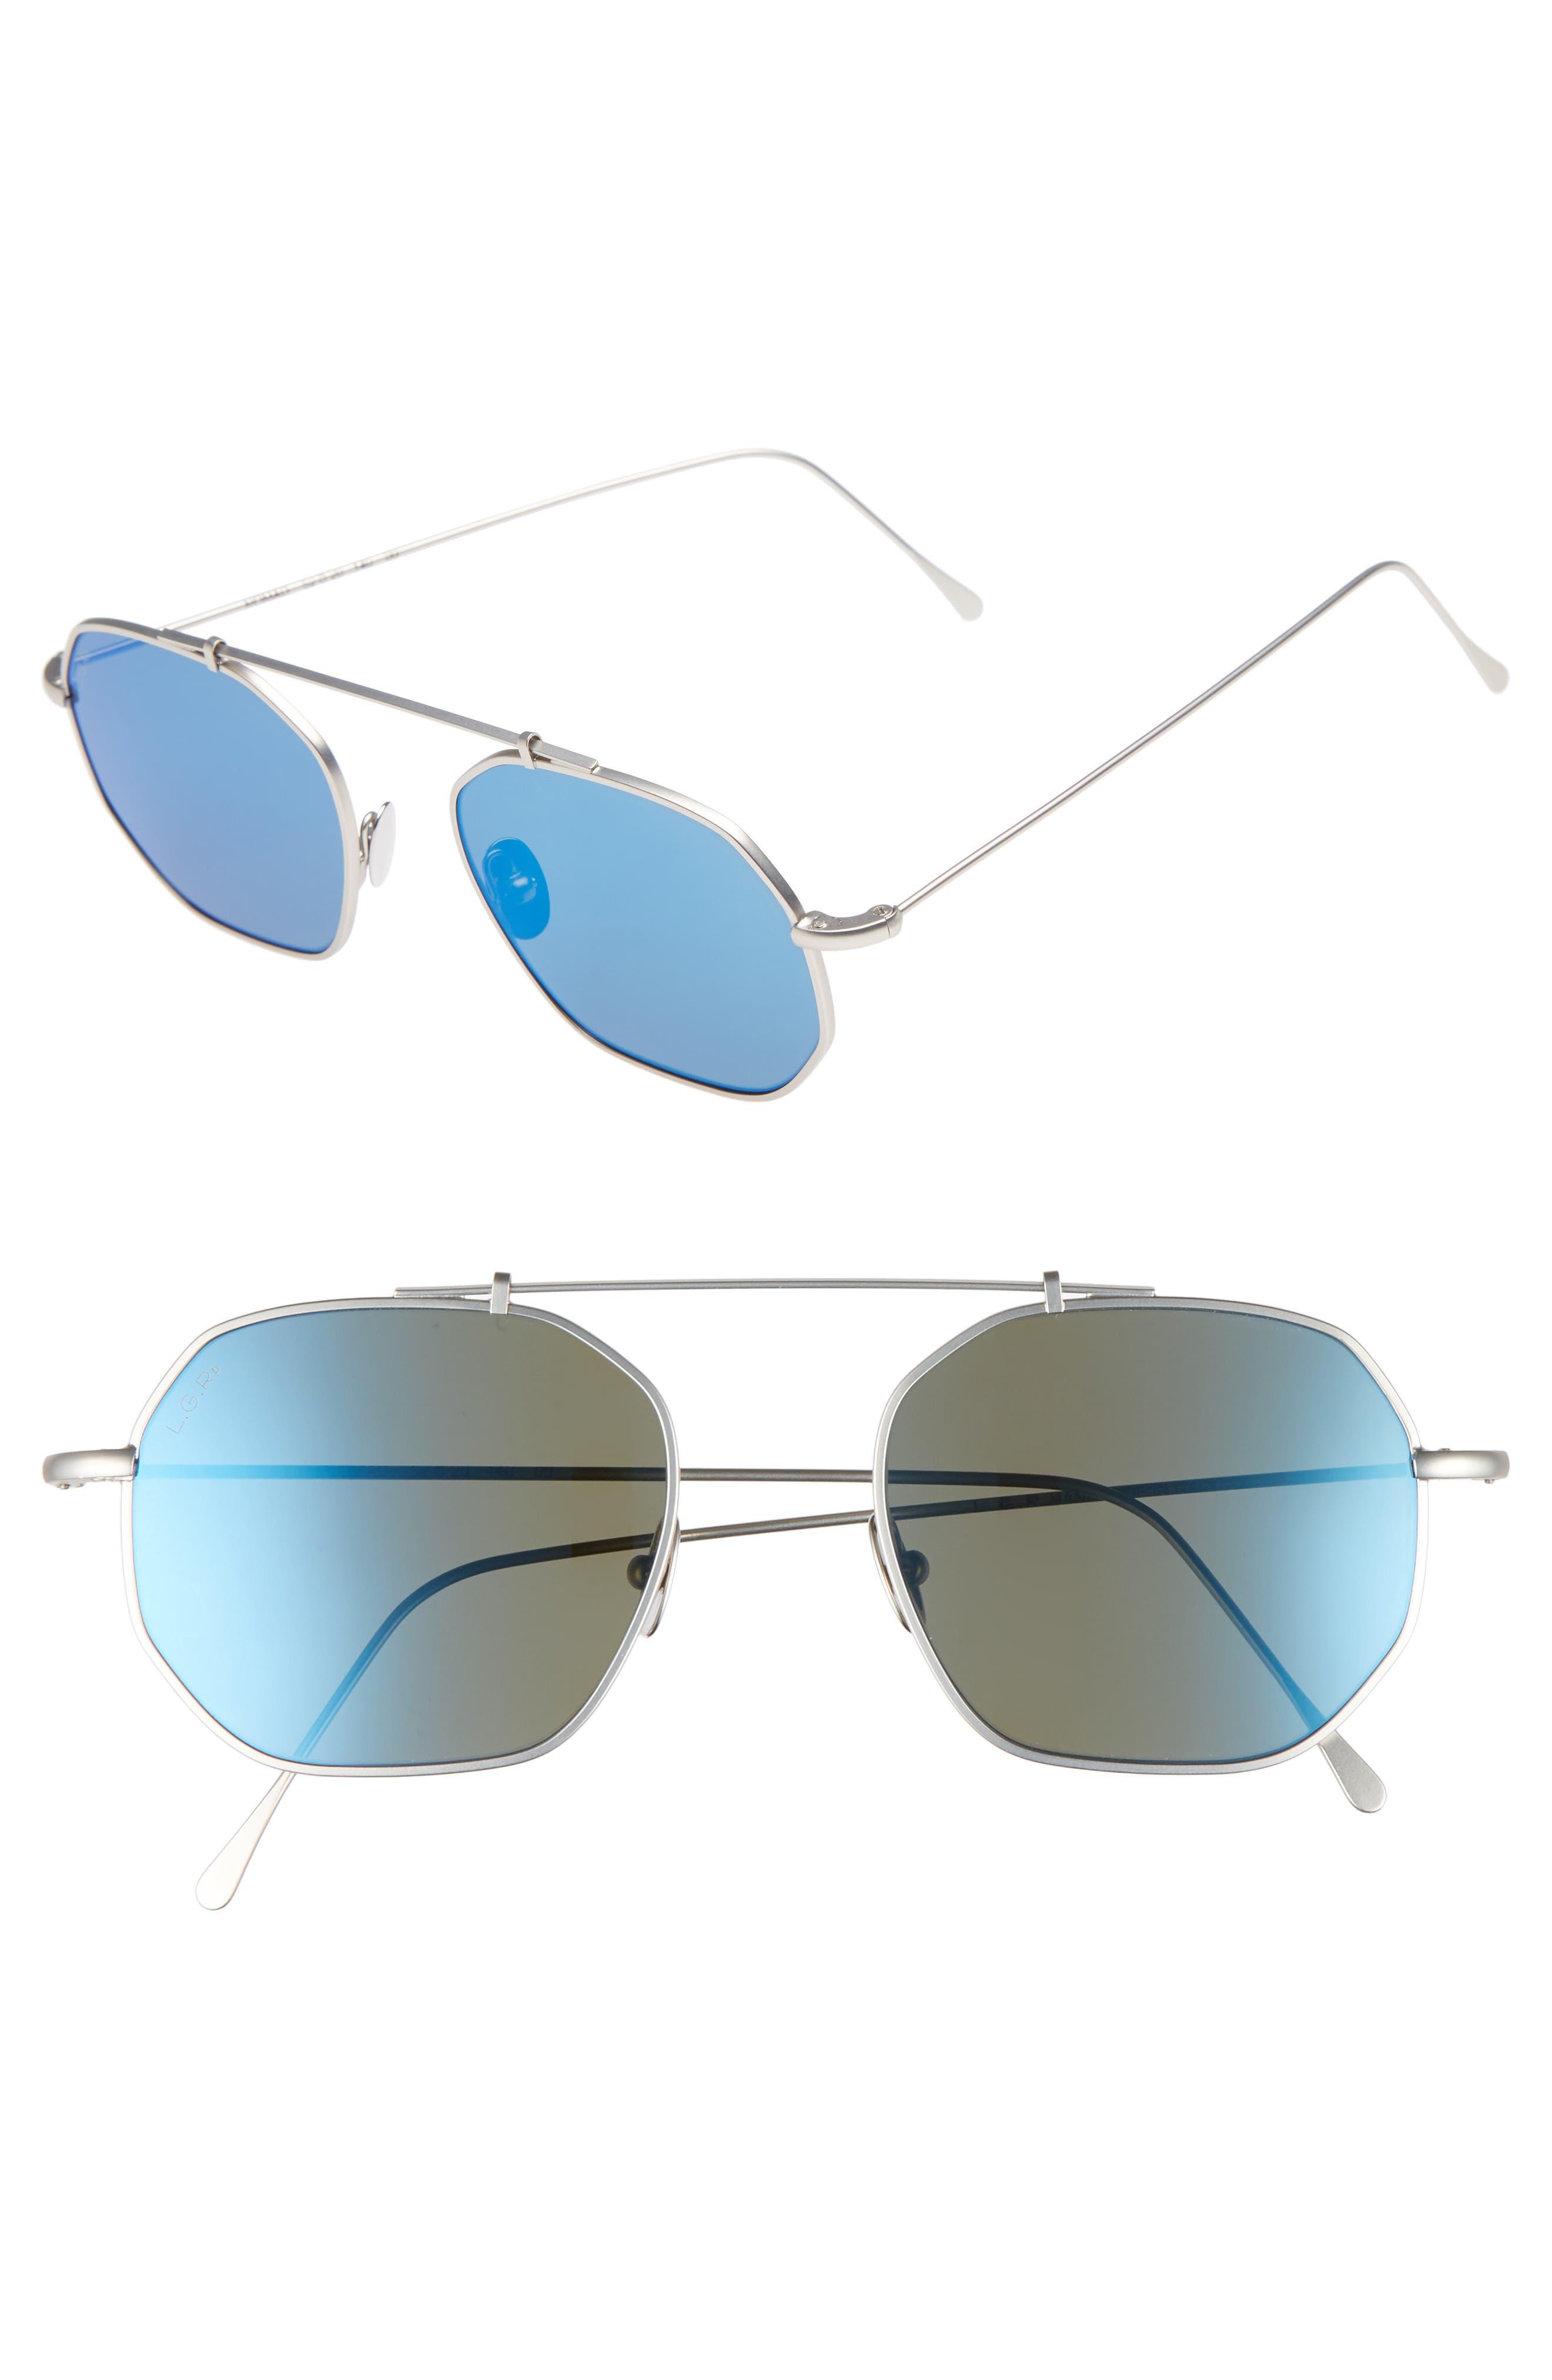 Nomad 52mm Polarized Sunglasses,                             Main thumbnail 1, color,                             040